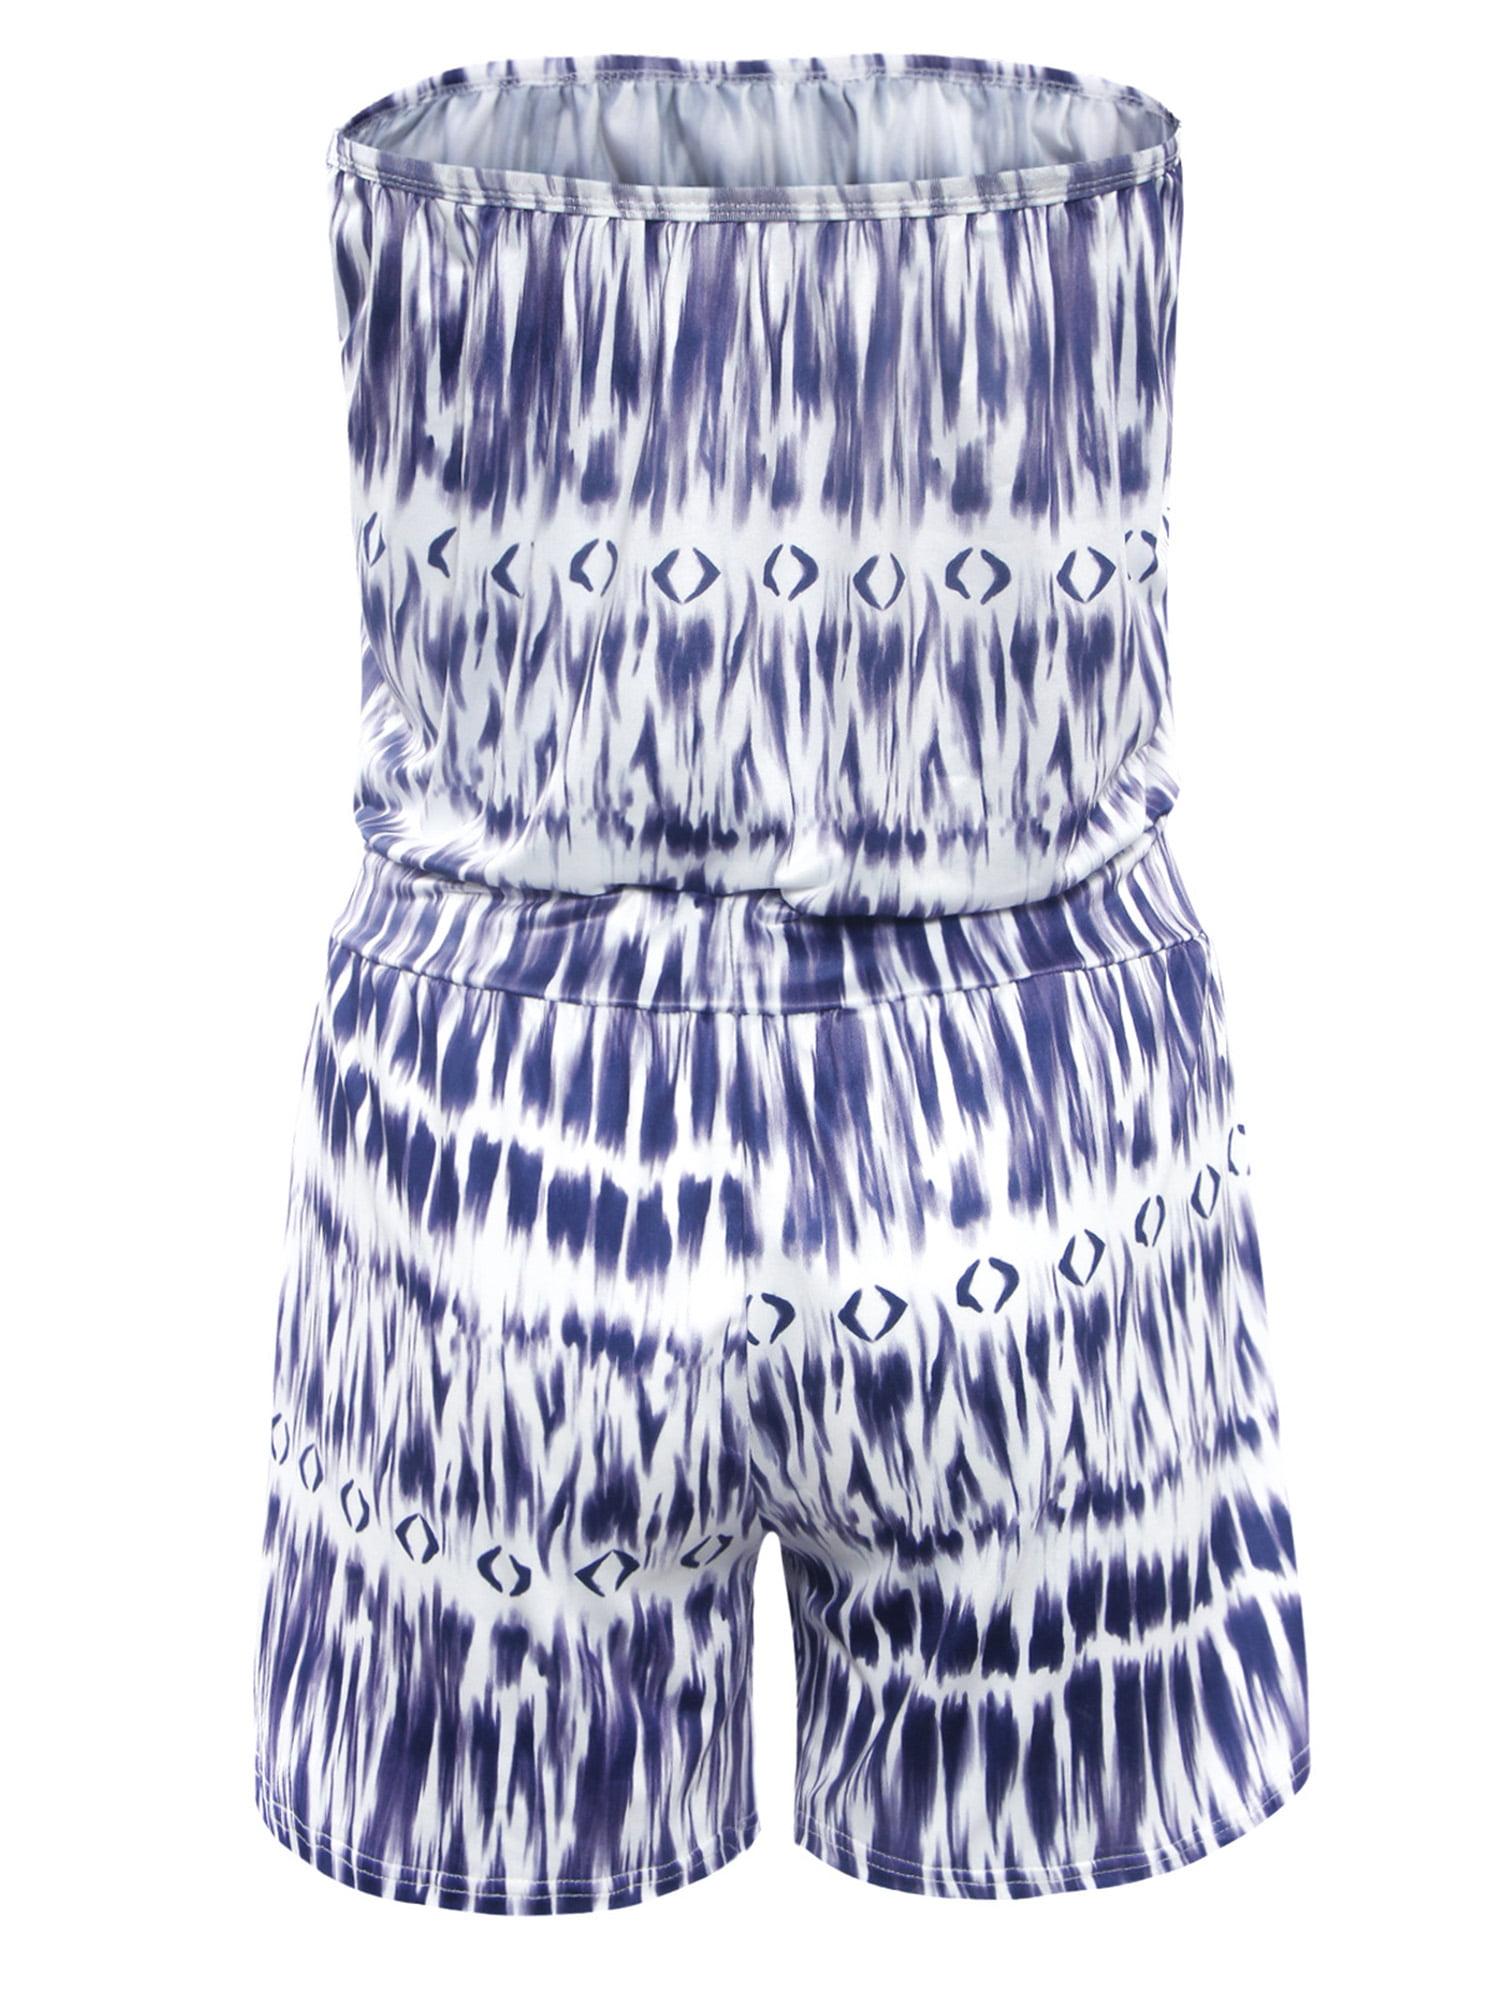 101e5c994 Topcobe - Topcobe Wrapped Jumpsuit Women Summer Clothing Romper,  Lightweight Summer Short Jumpsuit Rompers for Women, Blue Women Jumpsuits  on Sale (T2919BLL ...